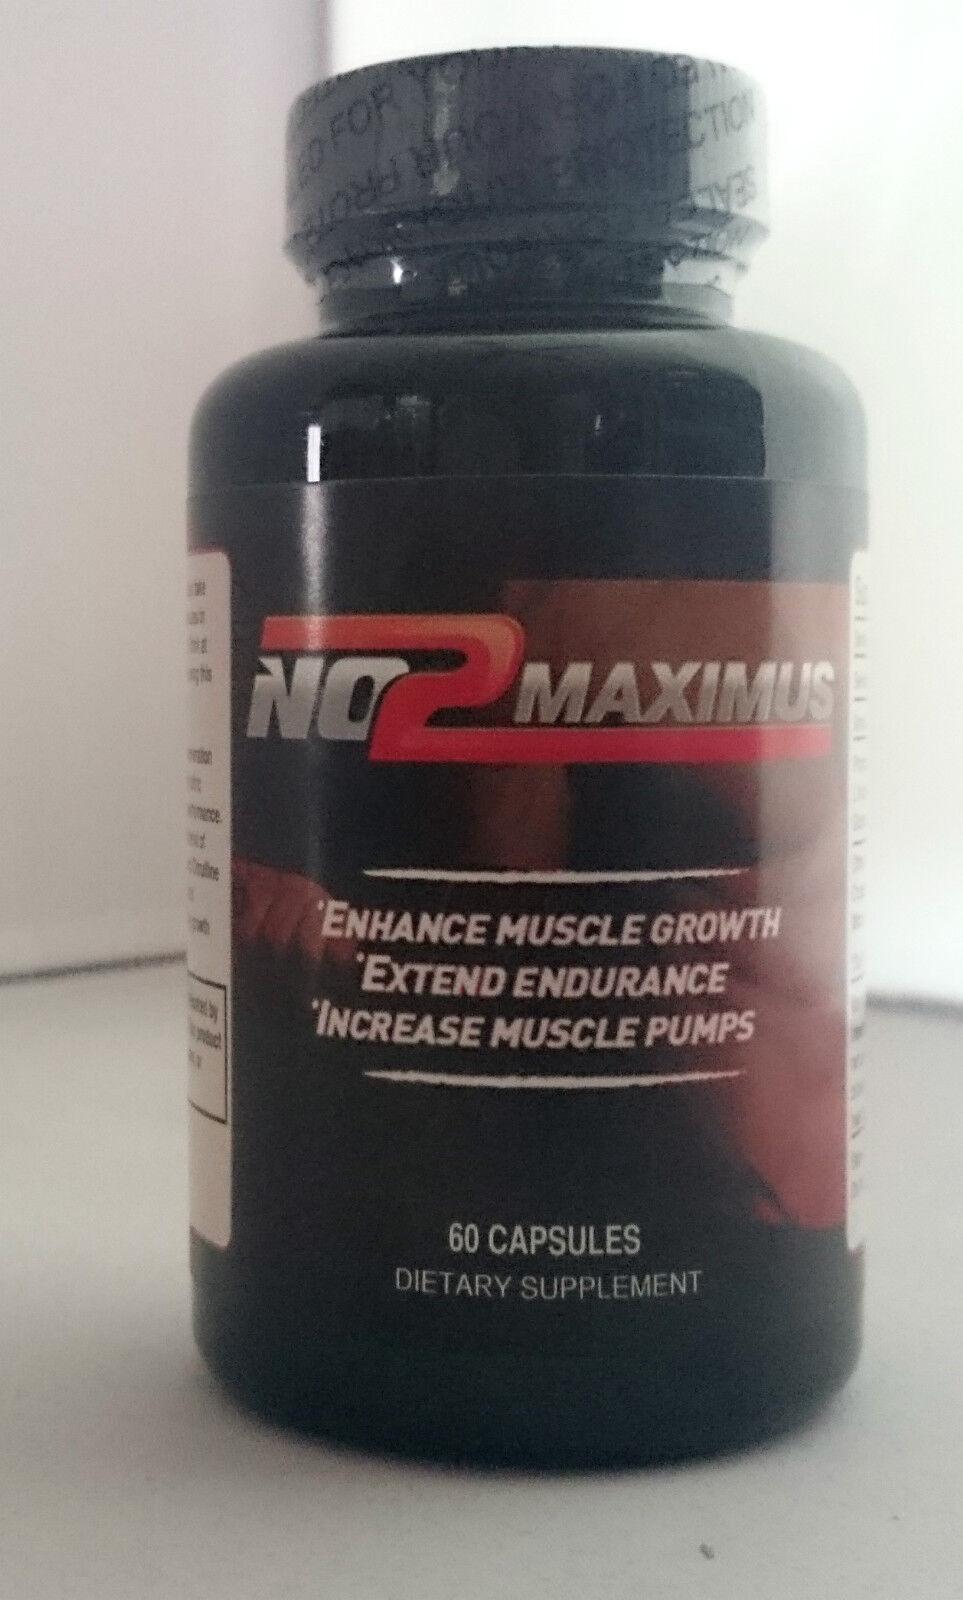 No2 Maximus Culturismo, Deportivo, Óxido Nítrico Preentrenamiento Fórmula